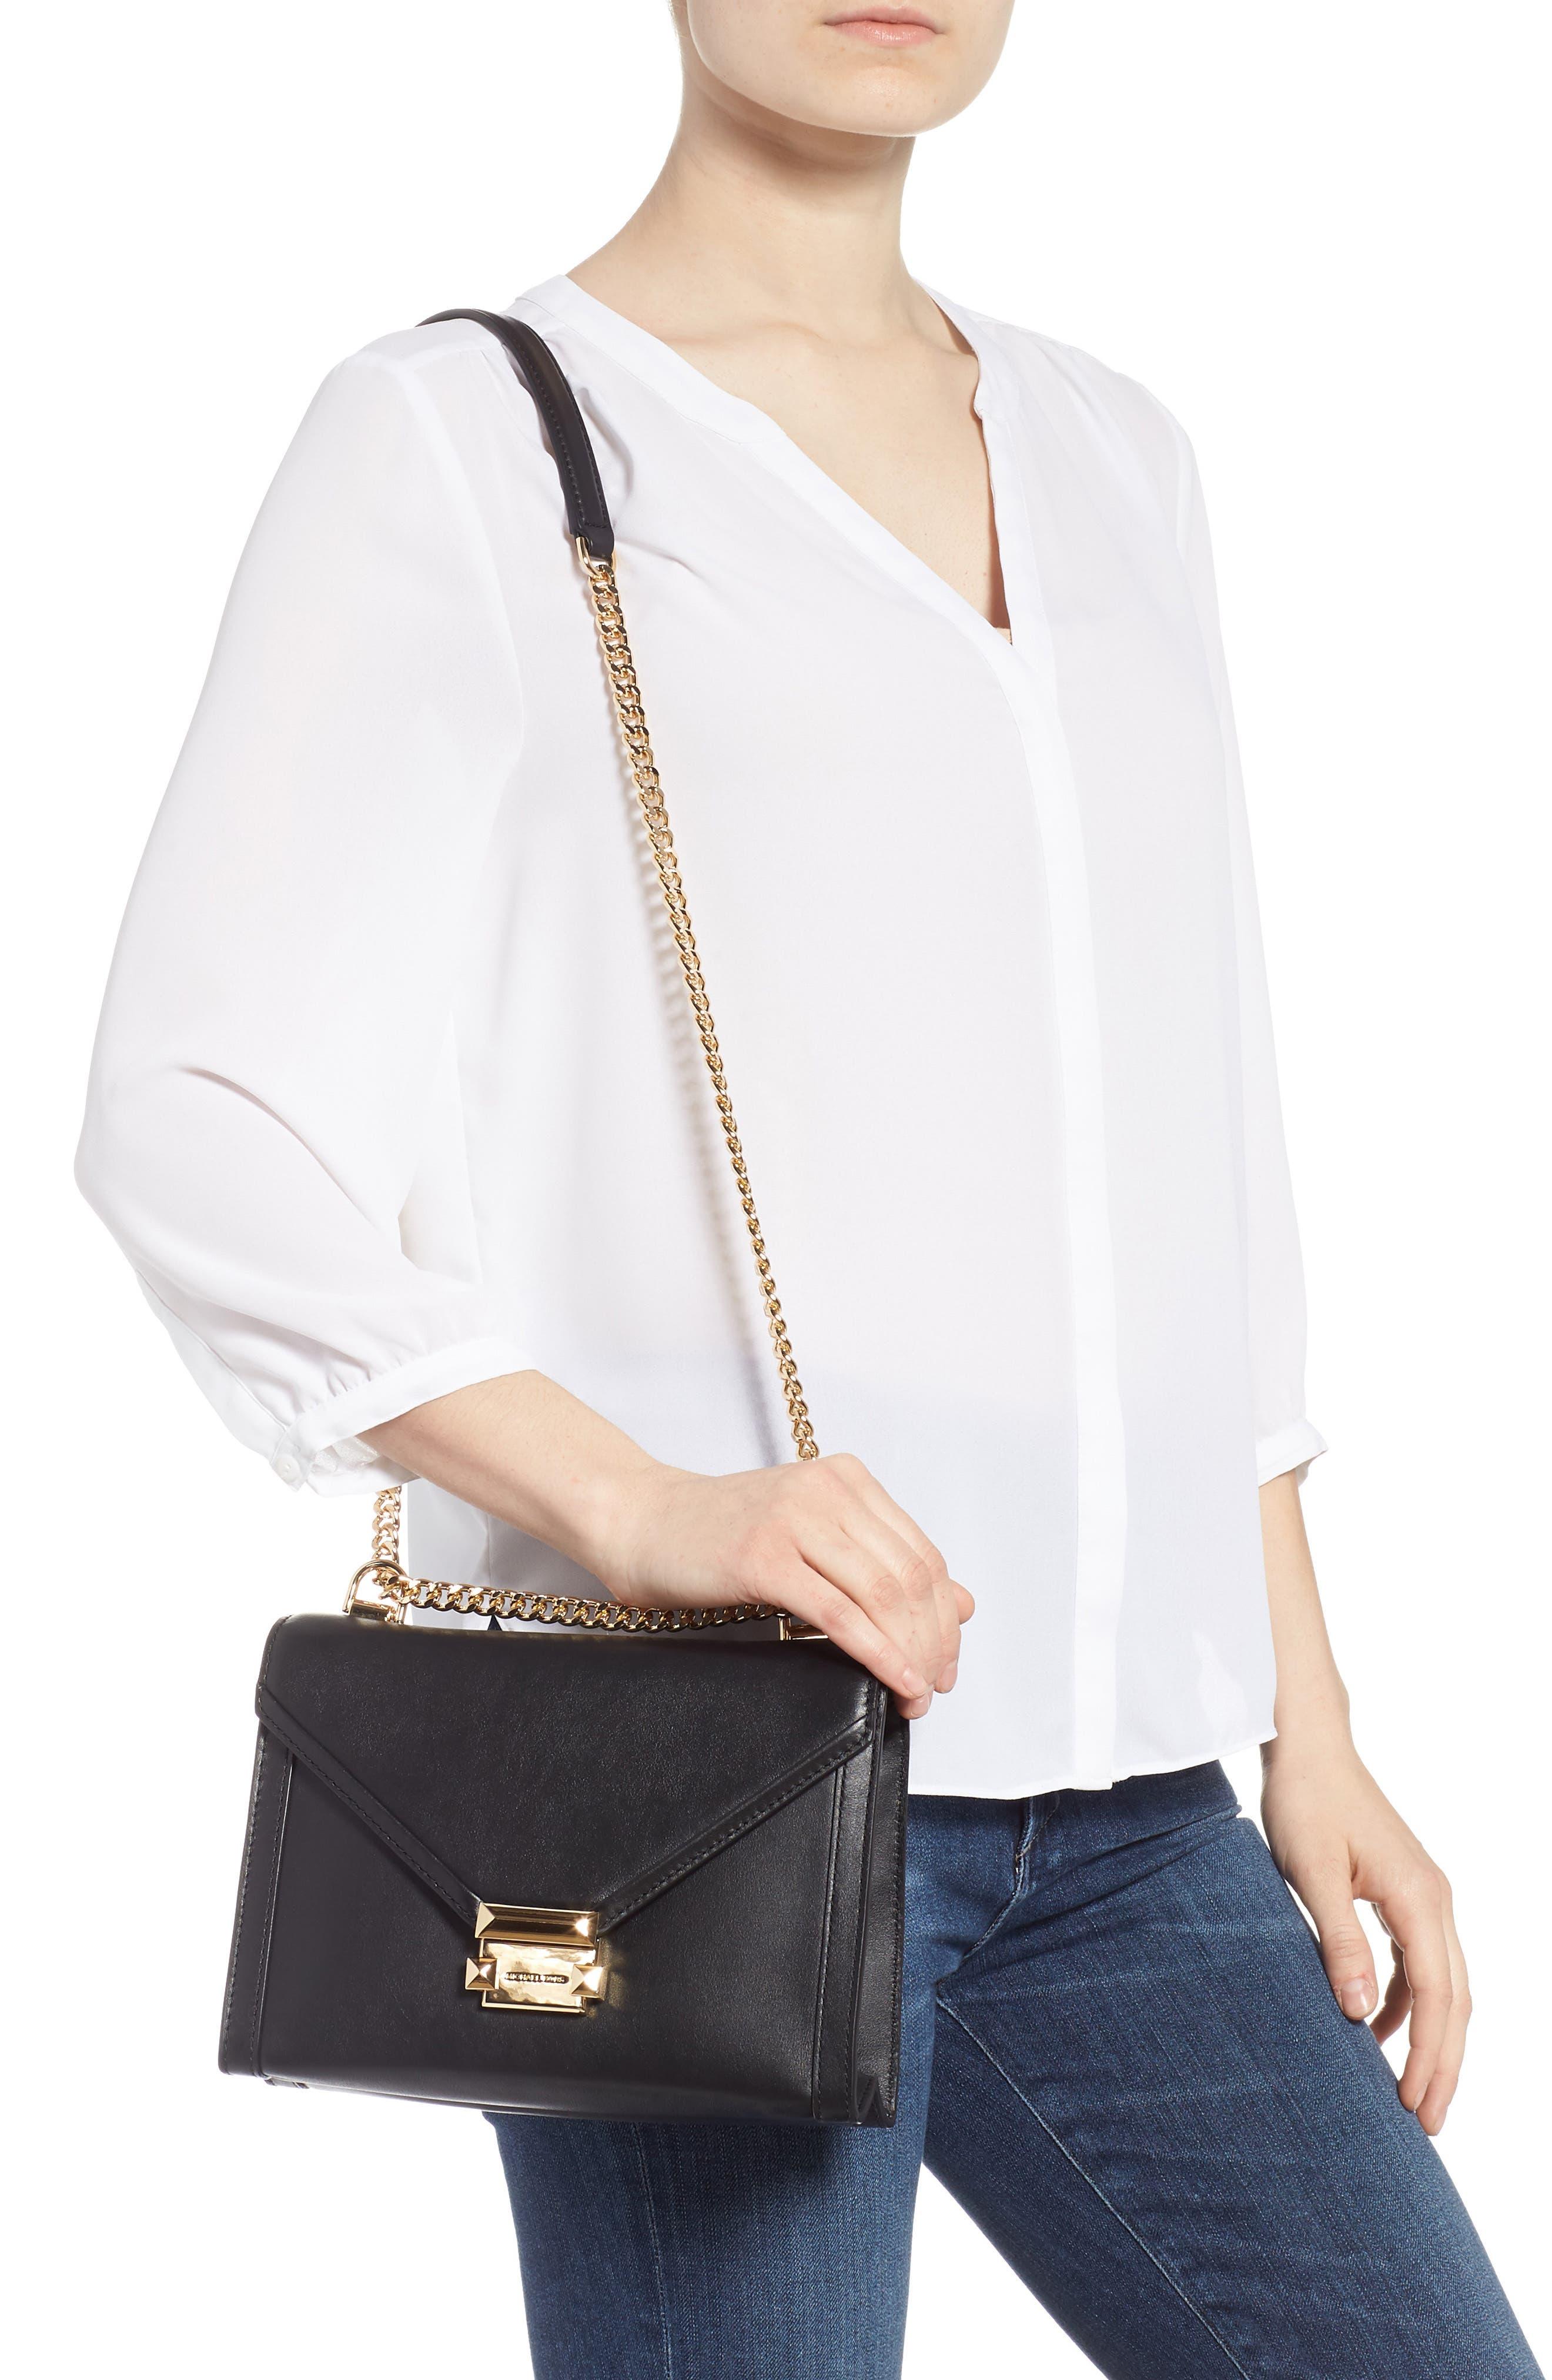 MICHAEL MICHAEL KORS,                             Large Whitney Leather Shoulder Bag,                             Alternate thumbnail 2, color,                             BLACK